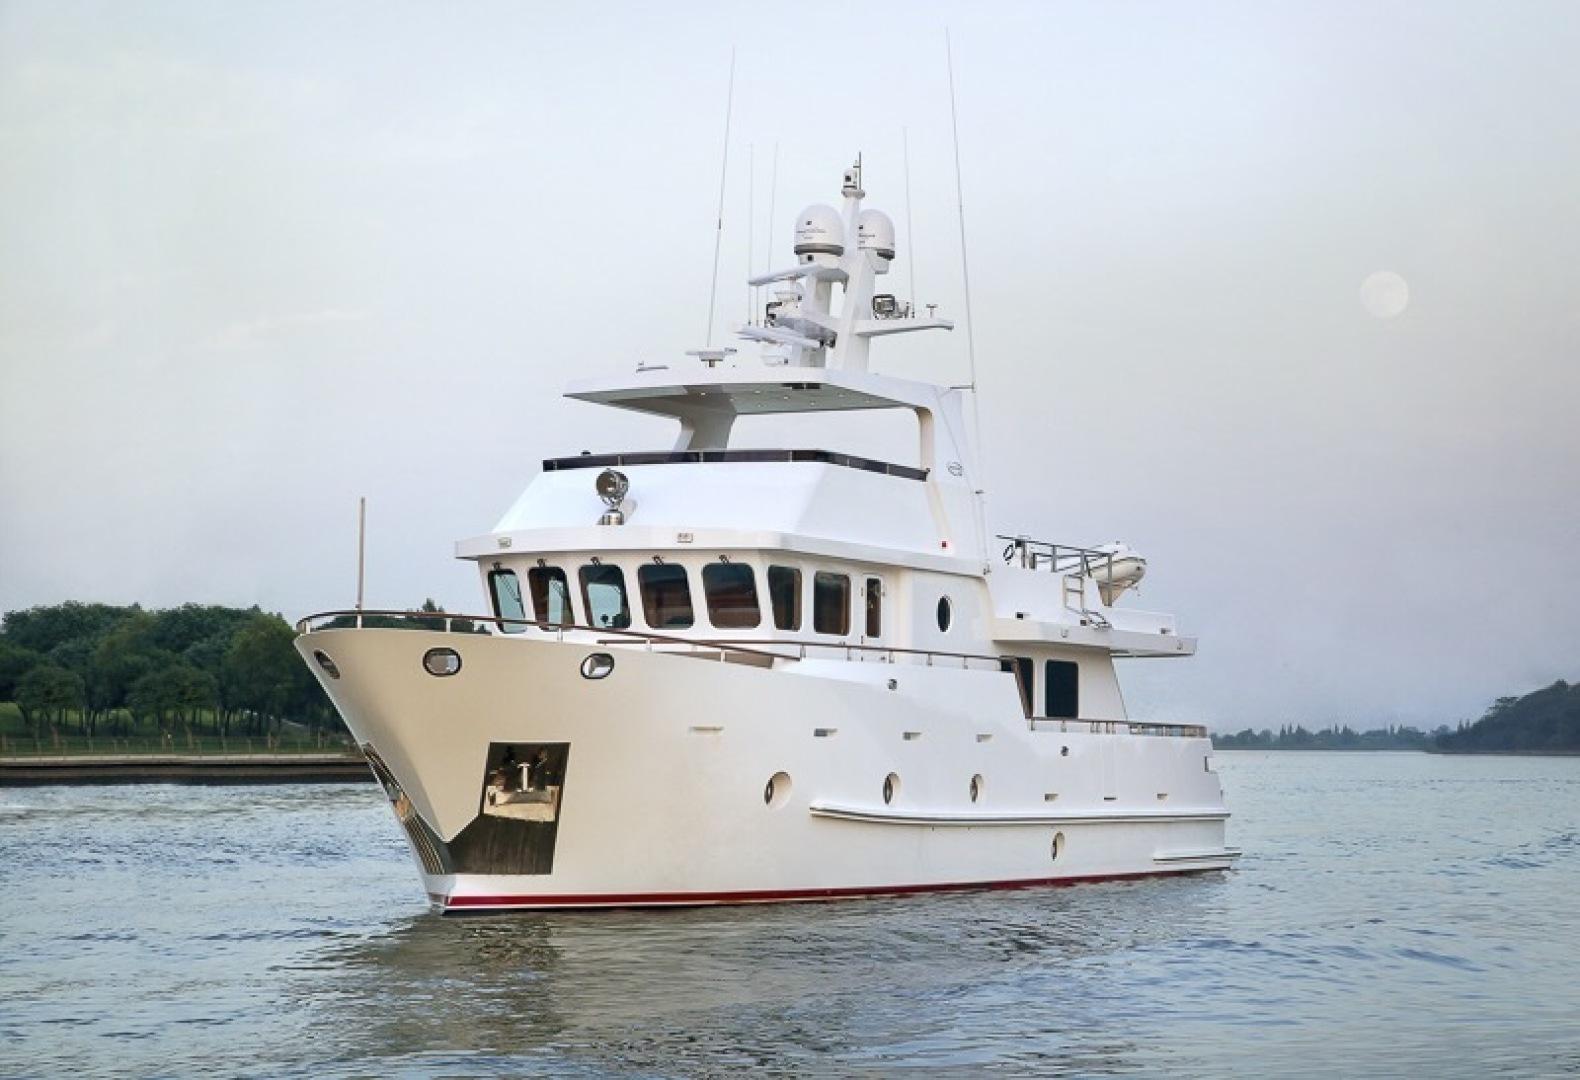 Bering-65 Bering Yacht 2013-Namaste Dania-Florida-United States-1401063   Thumbnail